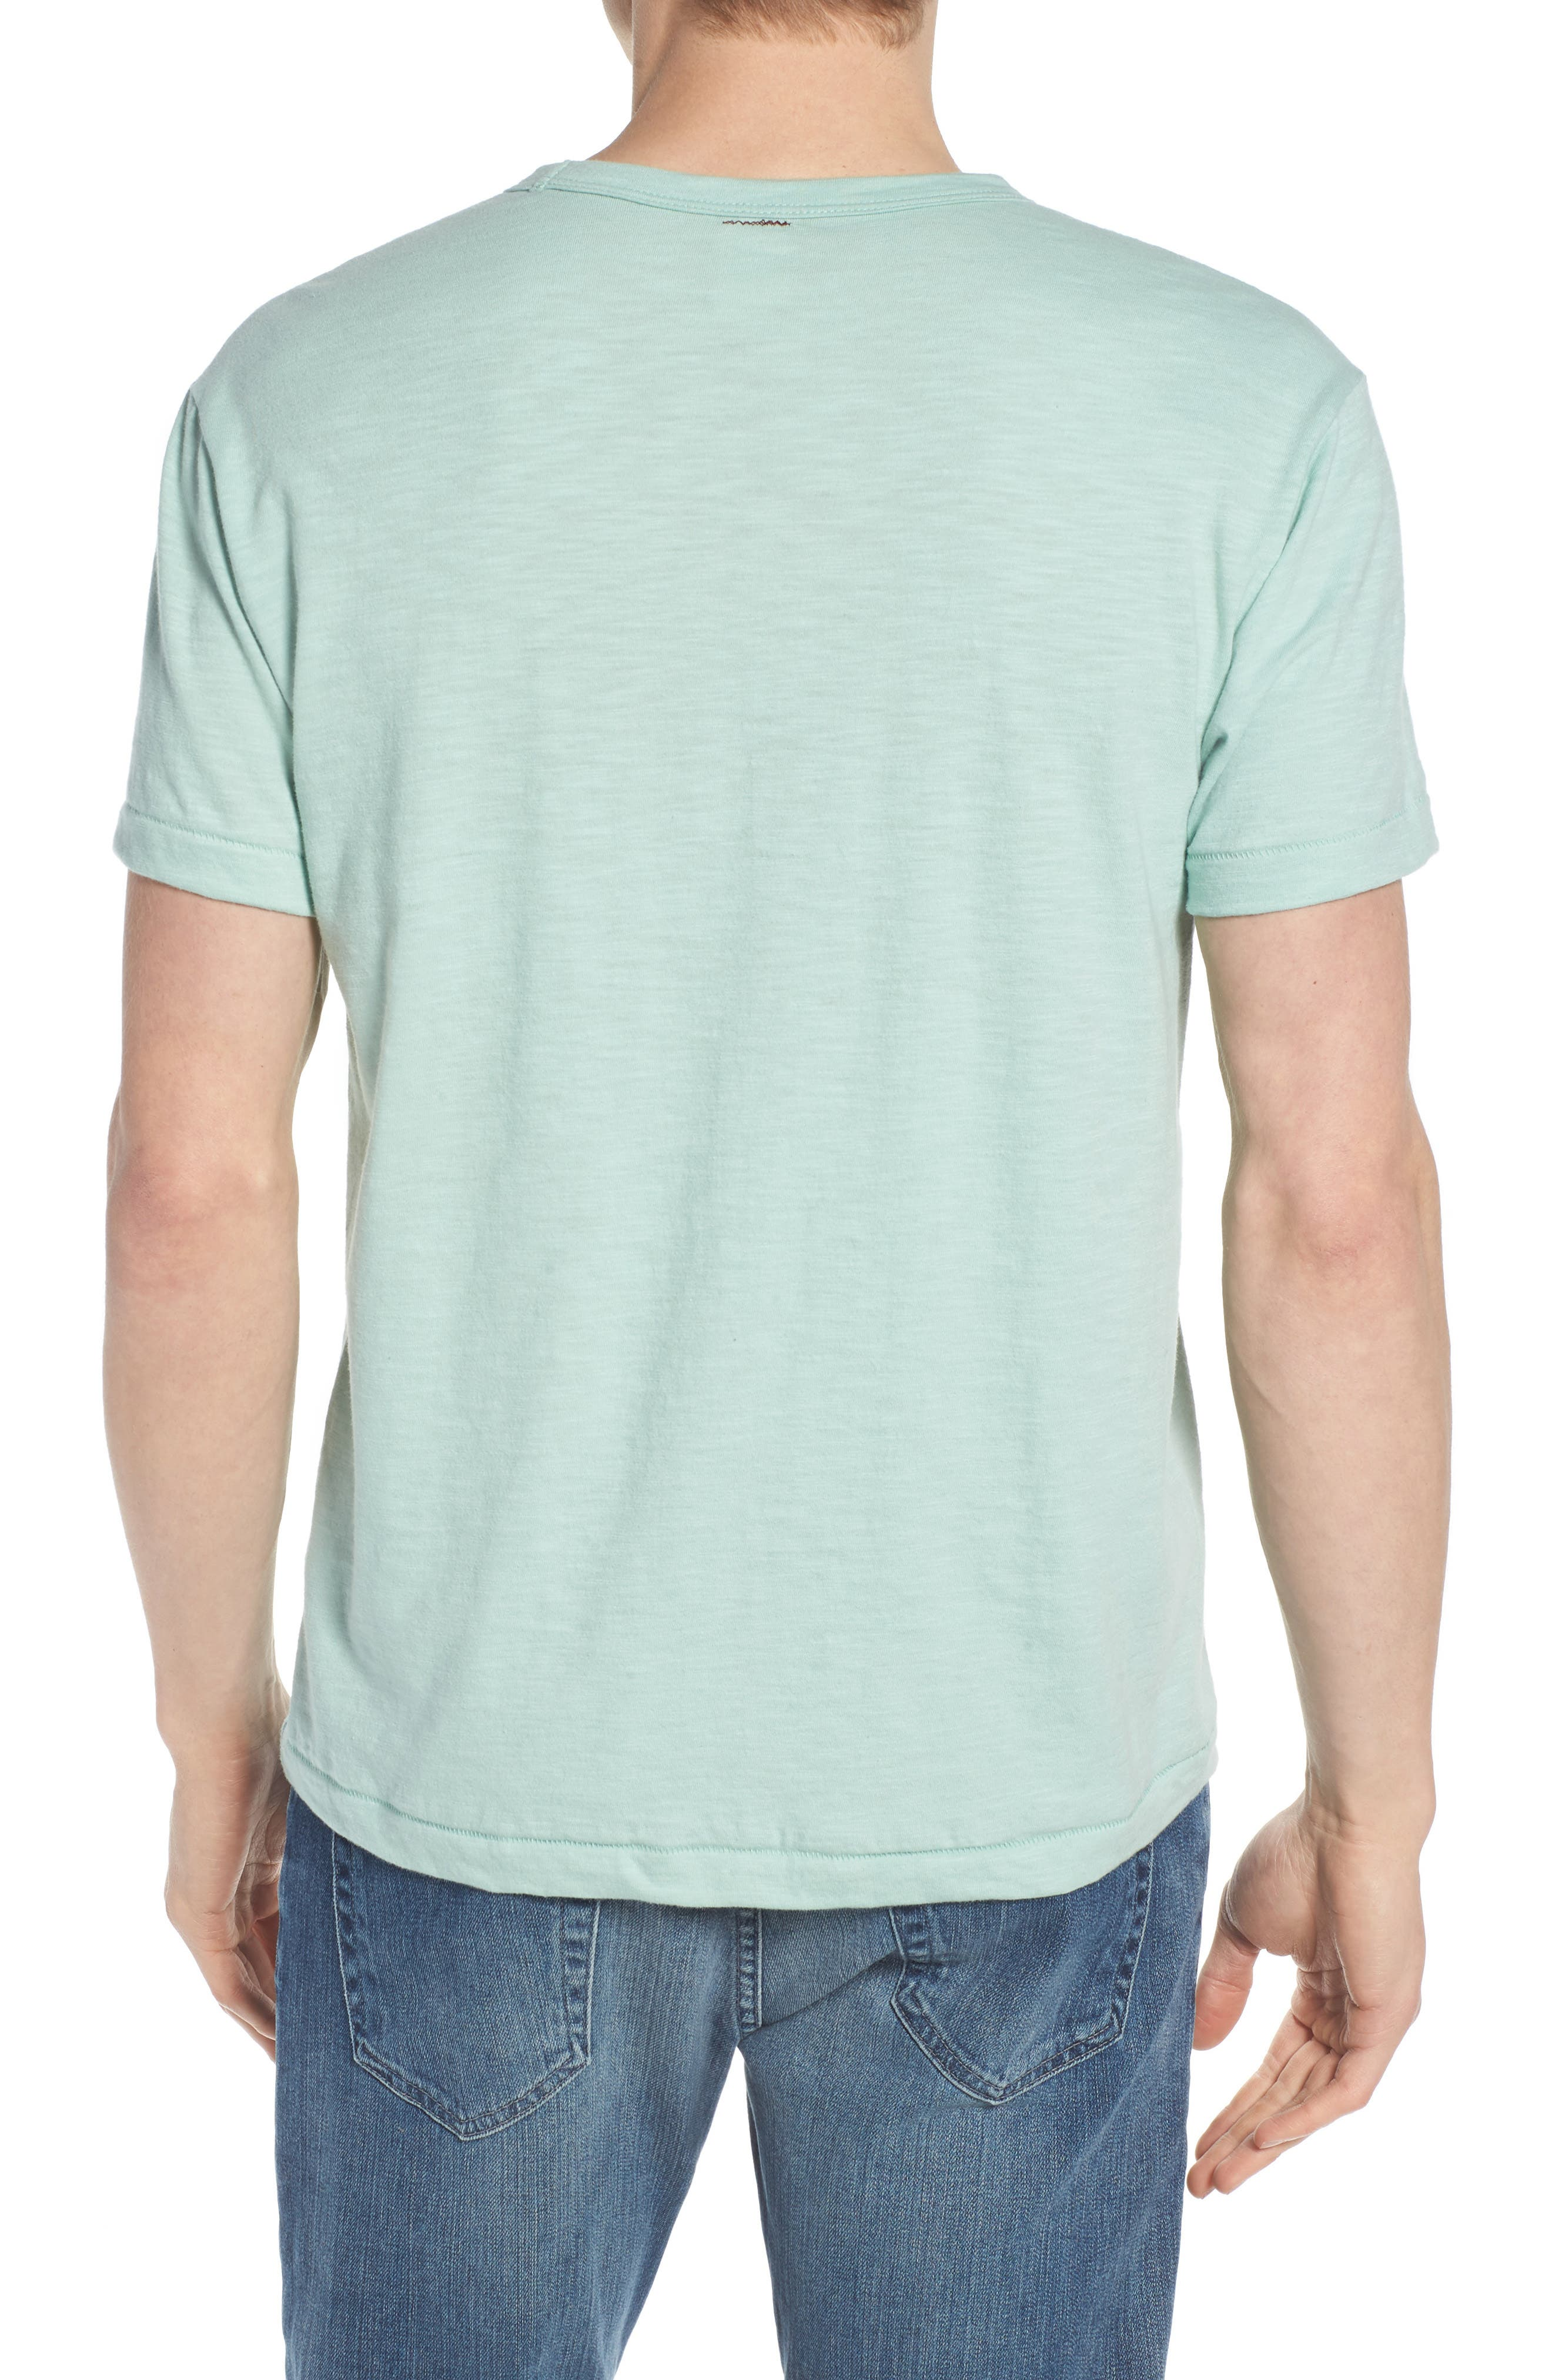 + Champion Crewneck T-Shirt,                             Alternate thumbnail 2, color,                             VINTAGE AQUA